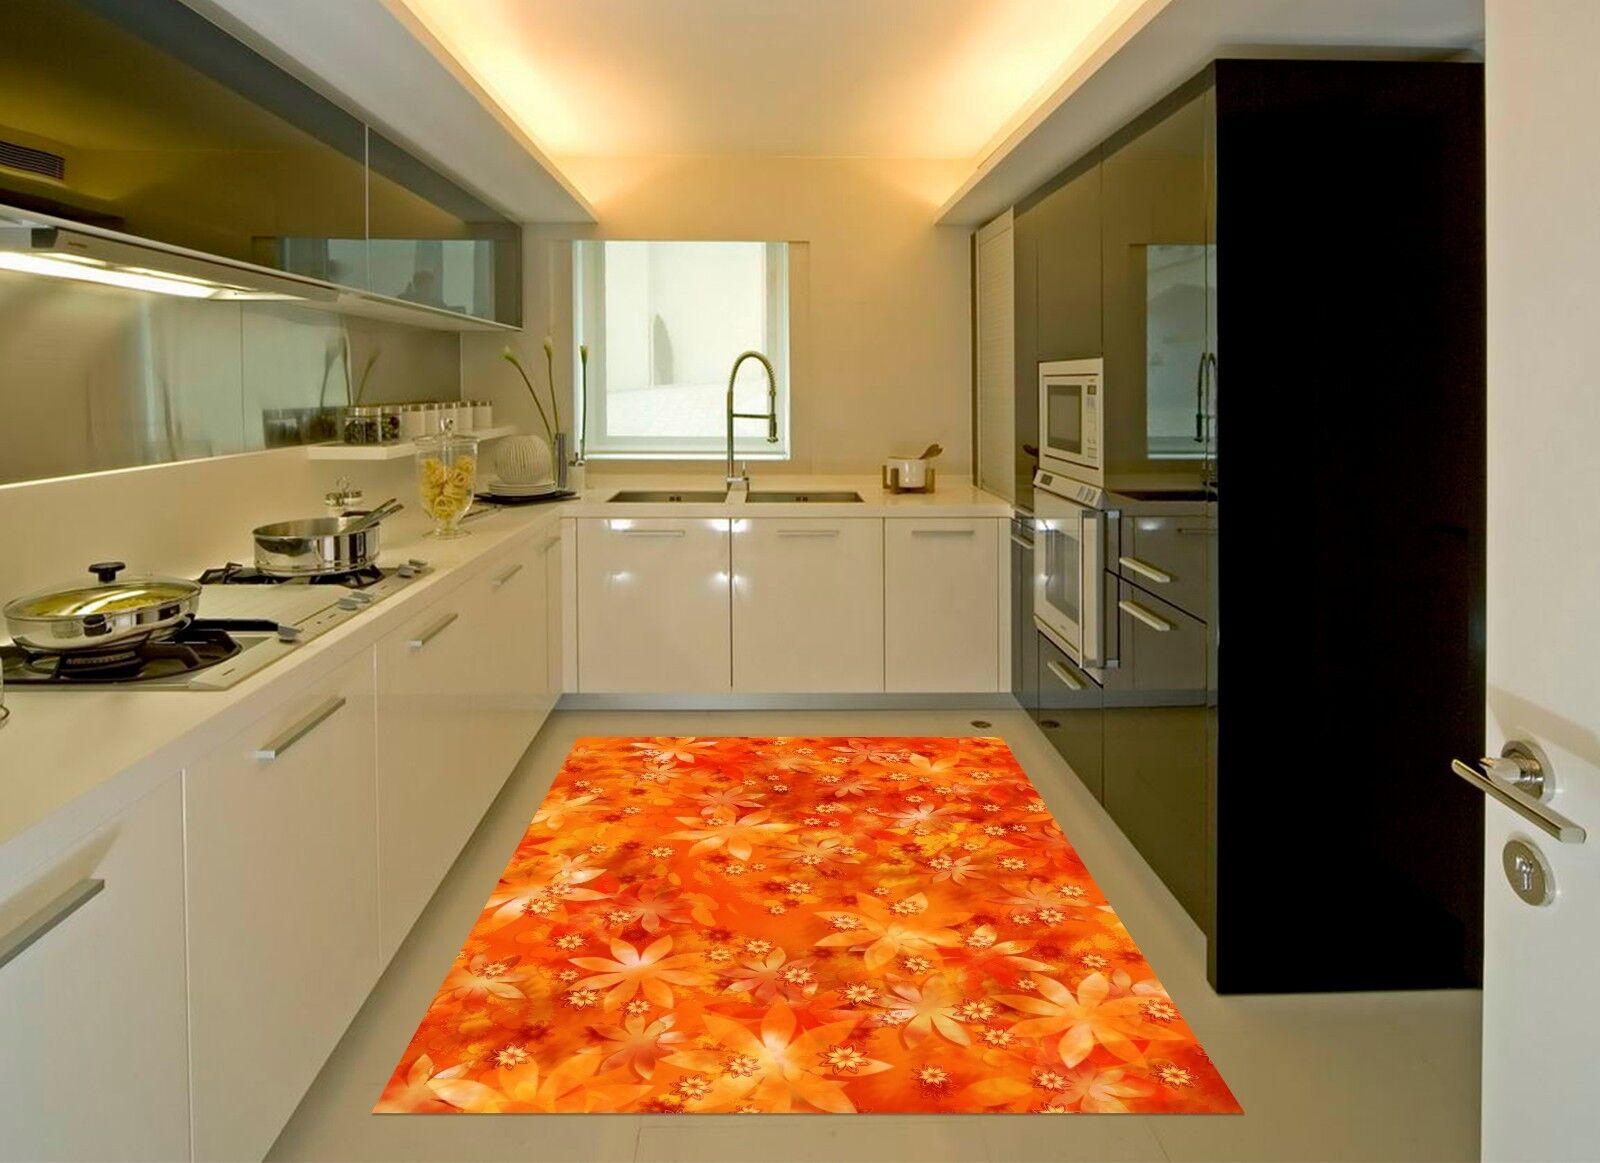 3D Orange Flowers 873 Kitchen Mat Floor Murals Wall Print Wall Deco UK Carly